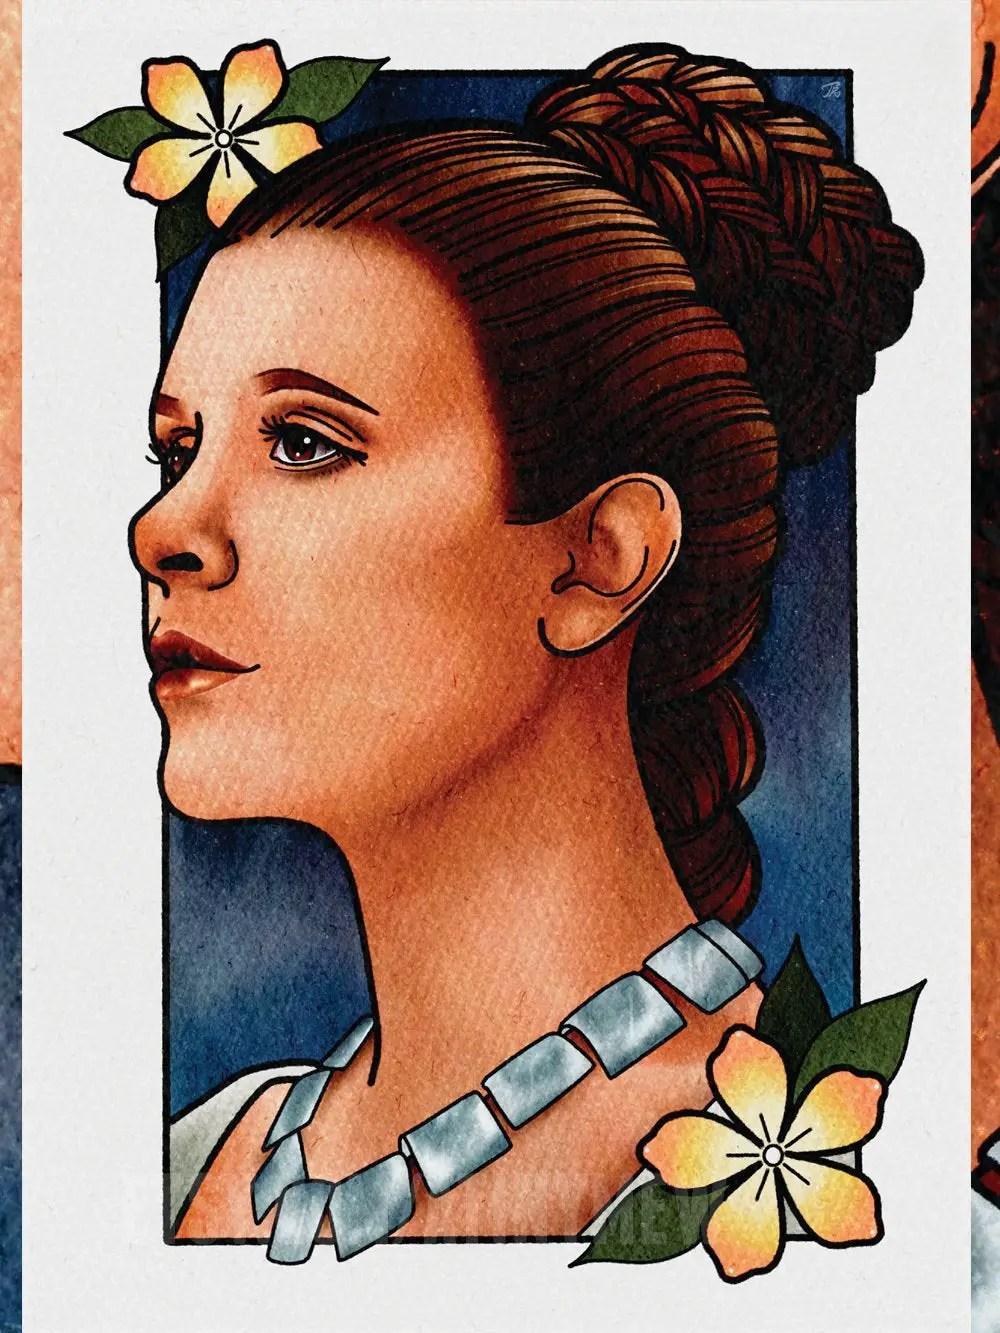 Feminist Art Prints: Princess Leia from Star Wars